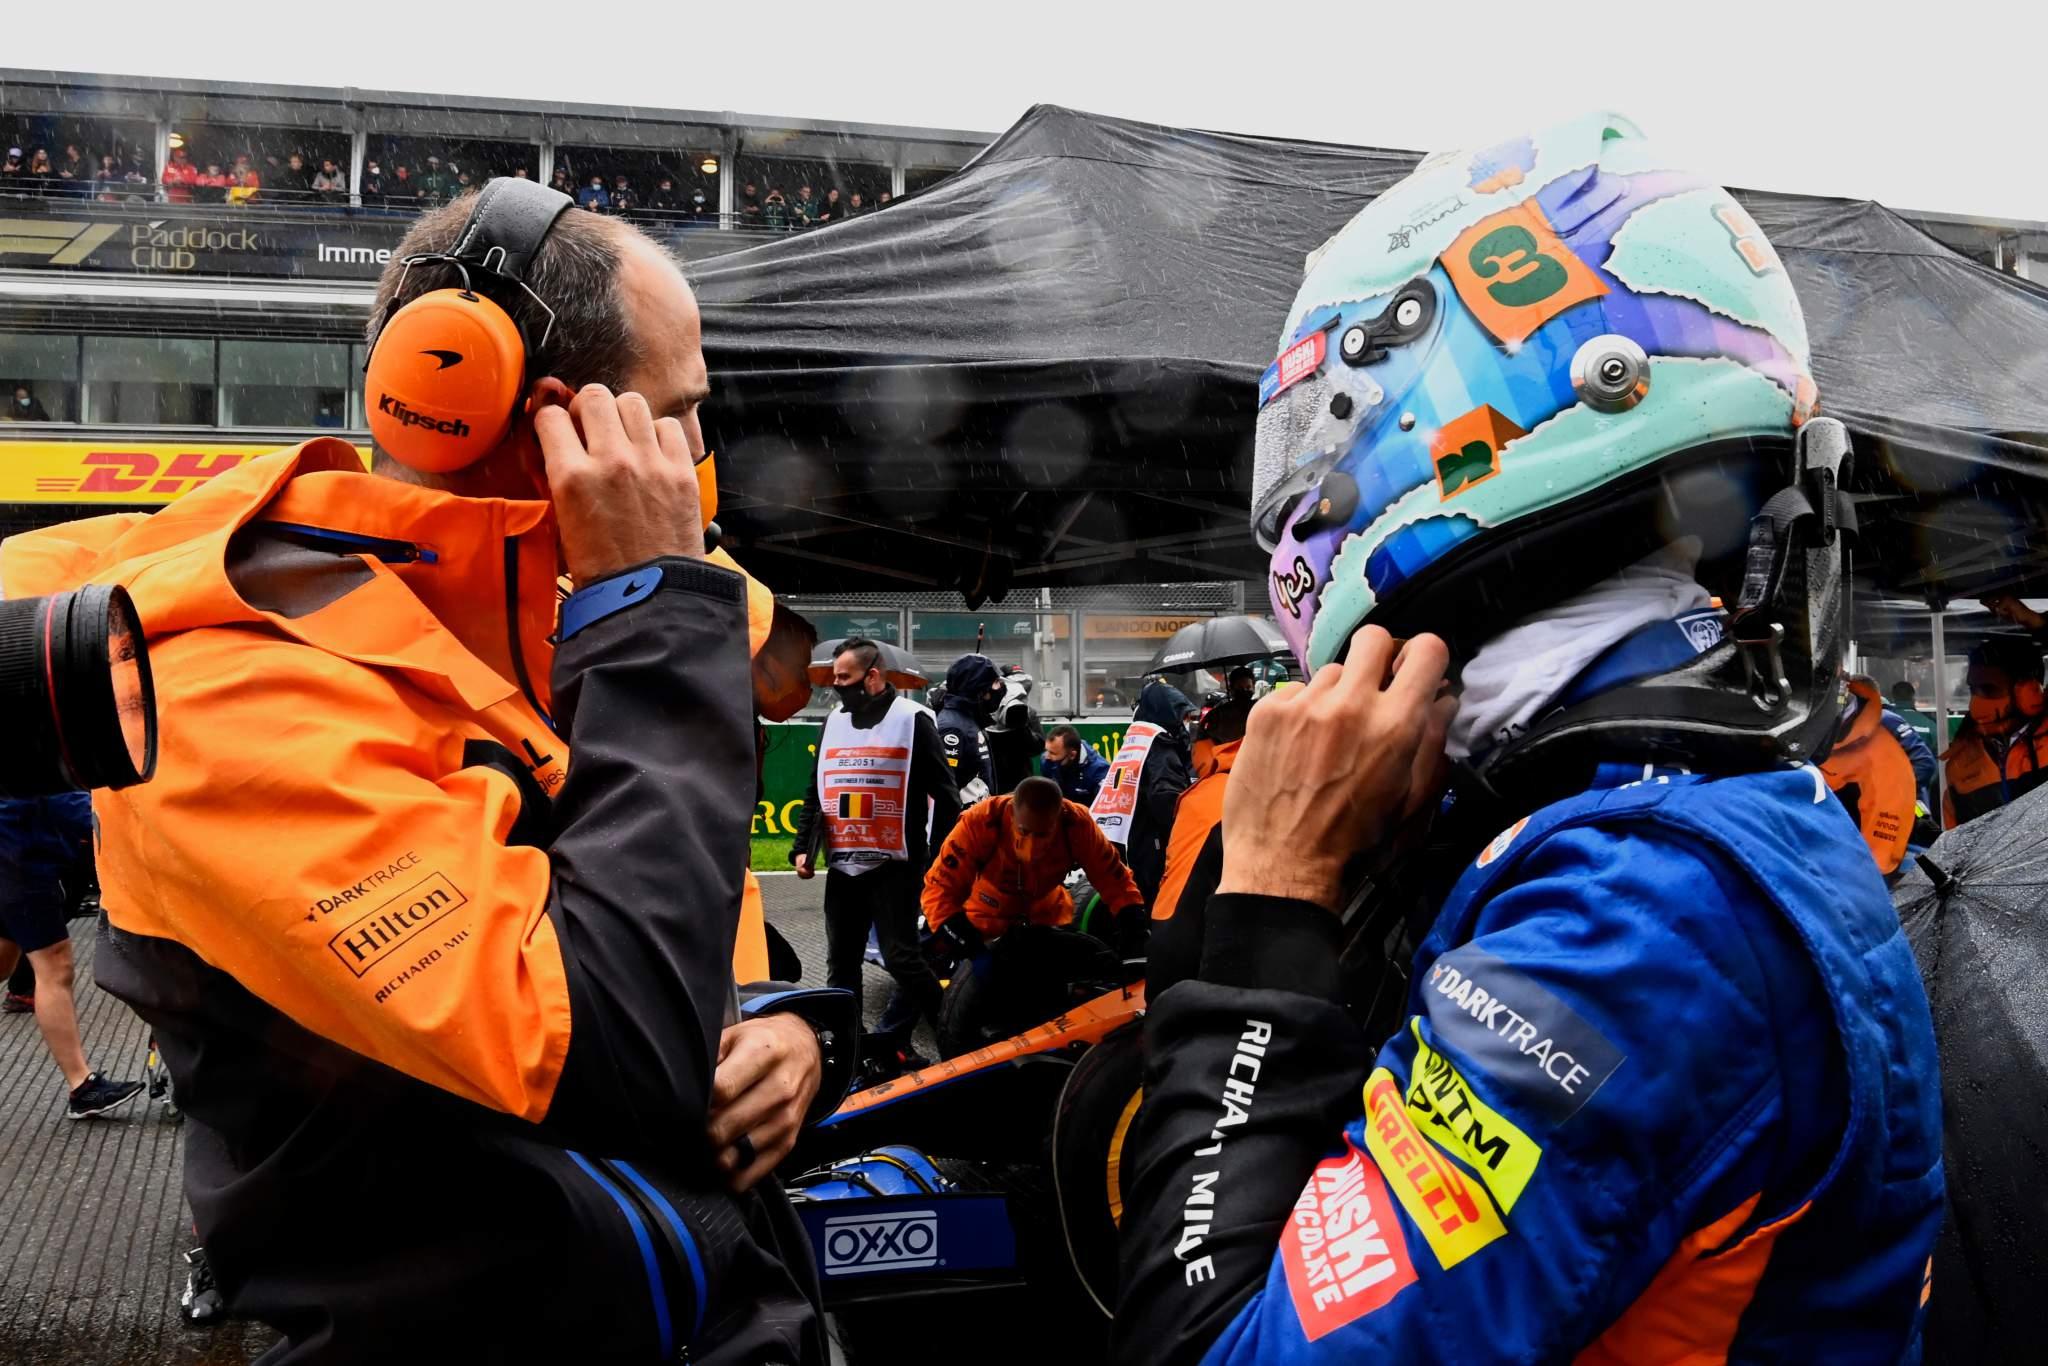 Motor Racing Formula One World Championship Grand Prix de Belgique Race Day Spa Francorchamps, Belgique